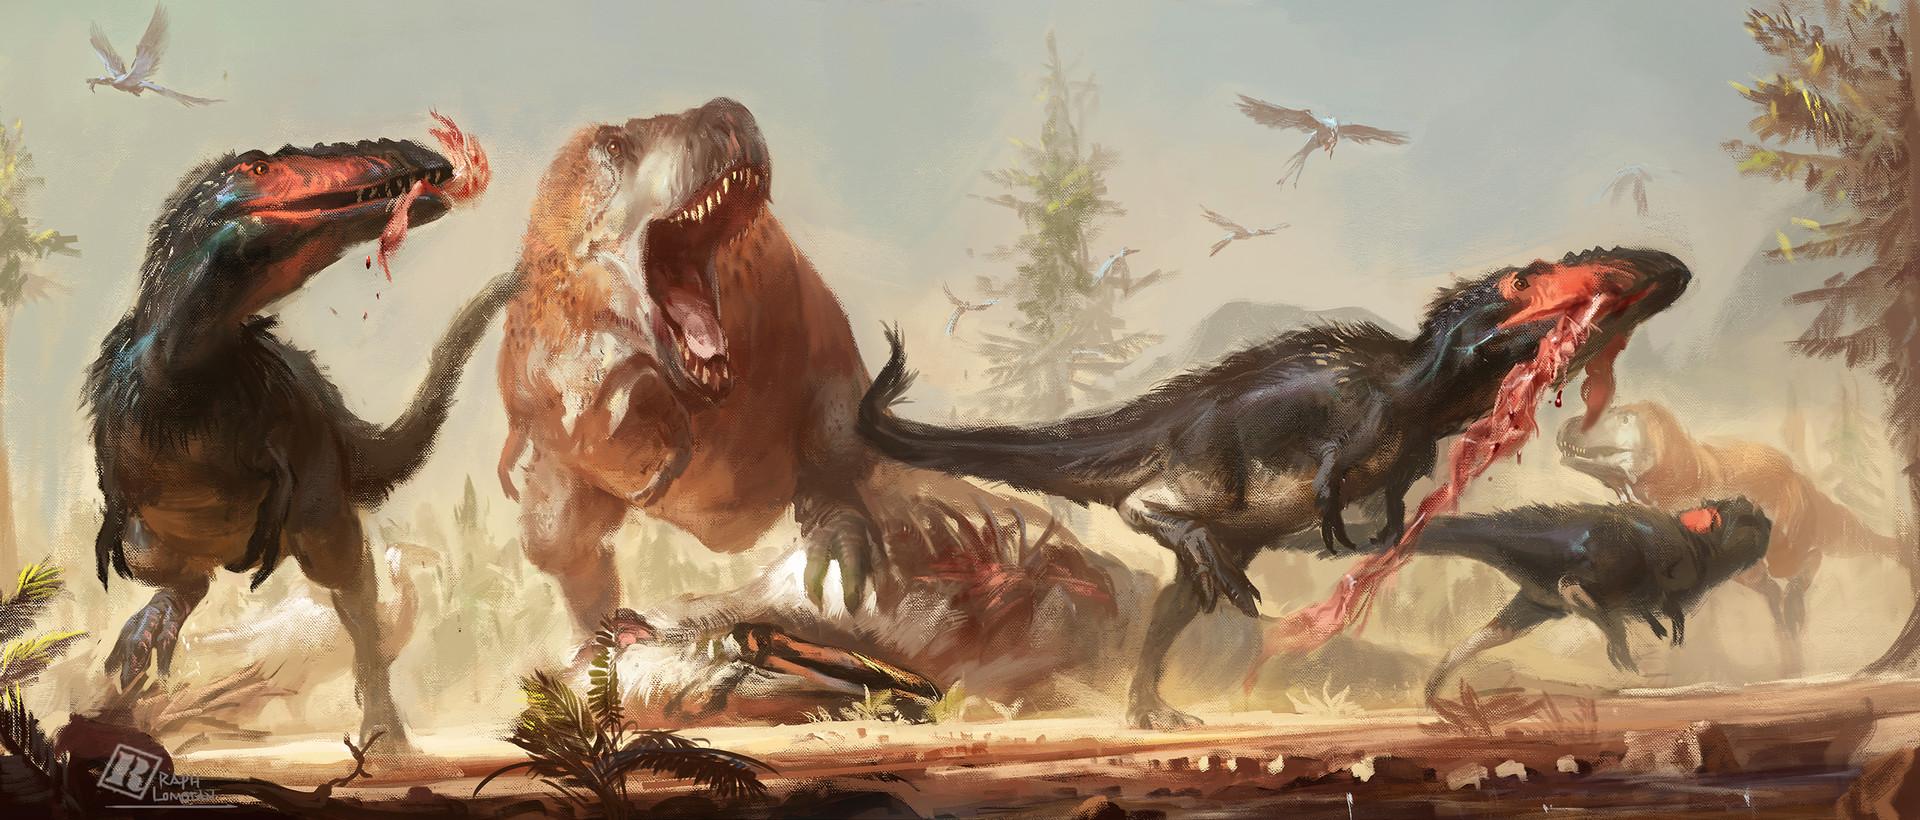 Raph lomotan asiantyrannosaurids27